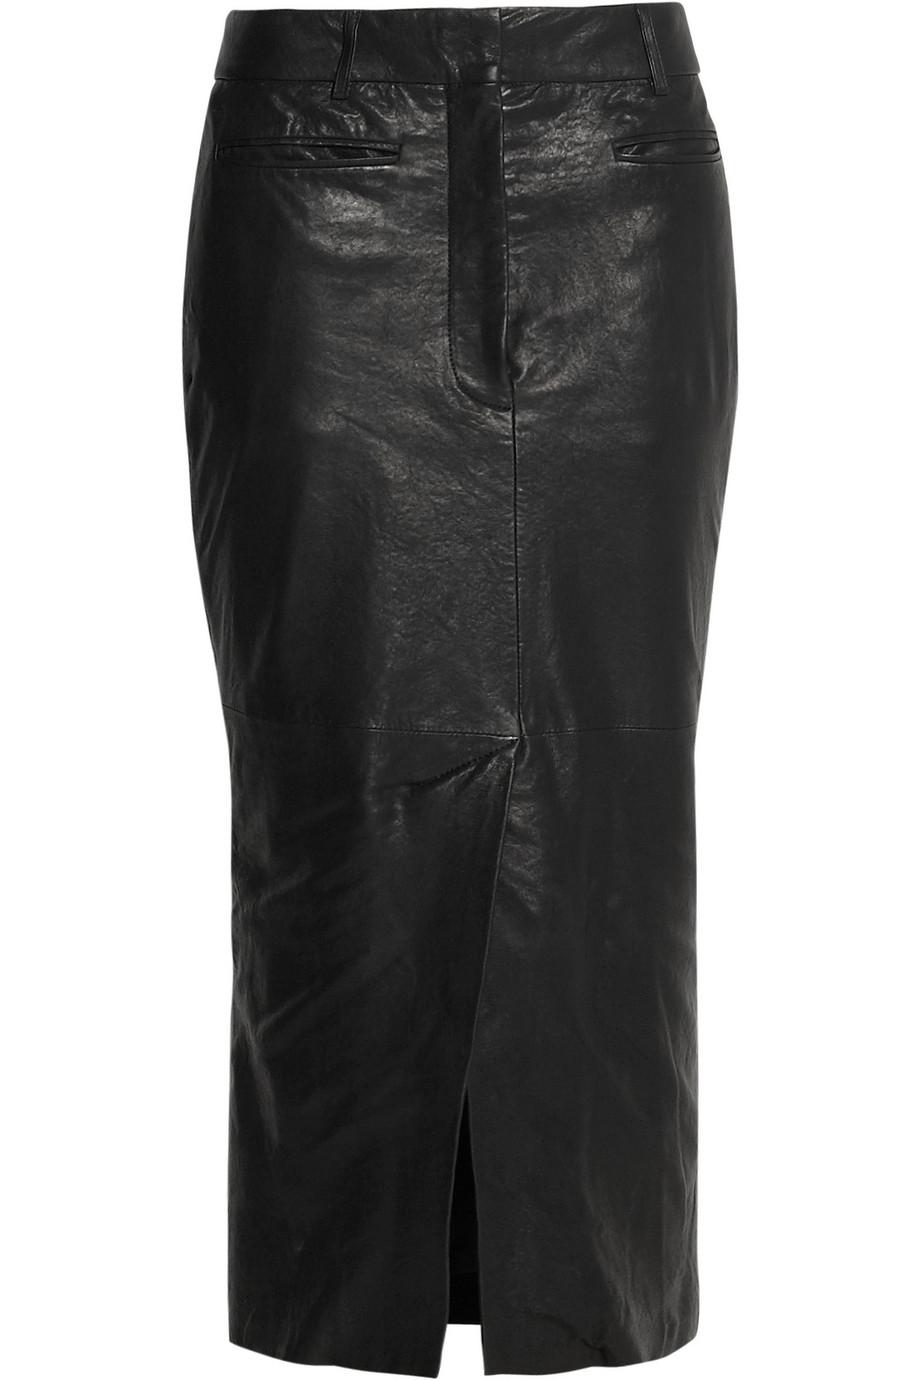 haider ackermann leather midi skirt in black lyst